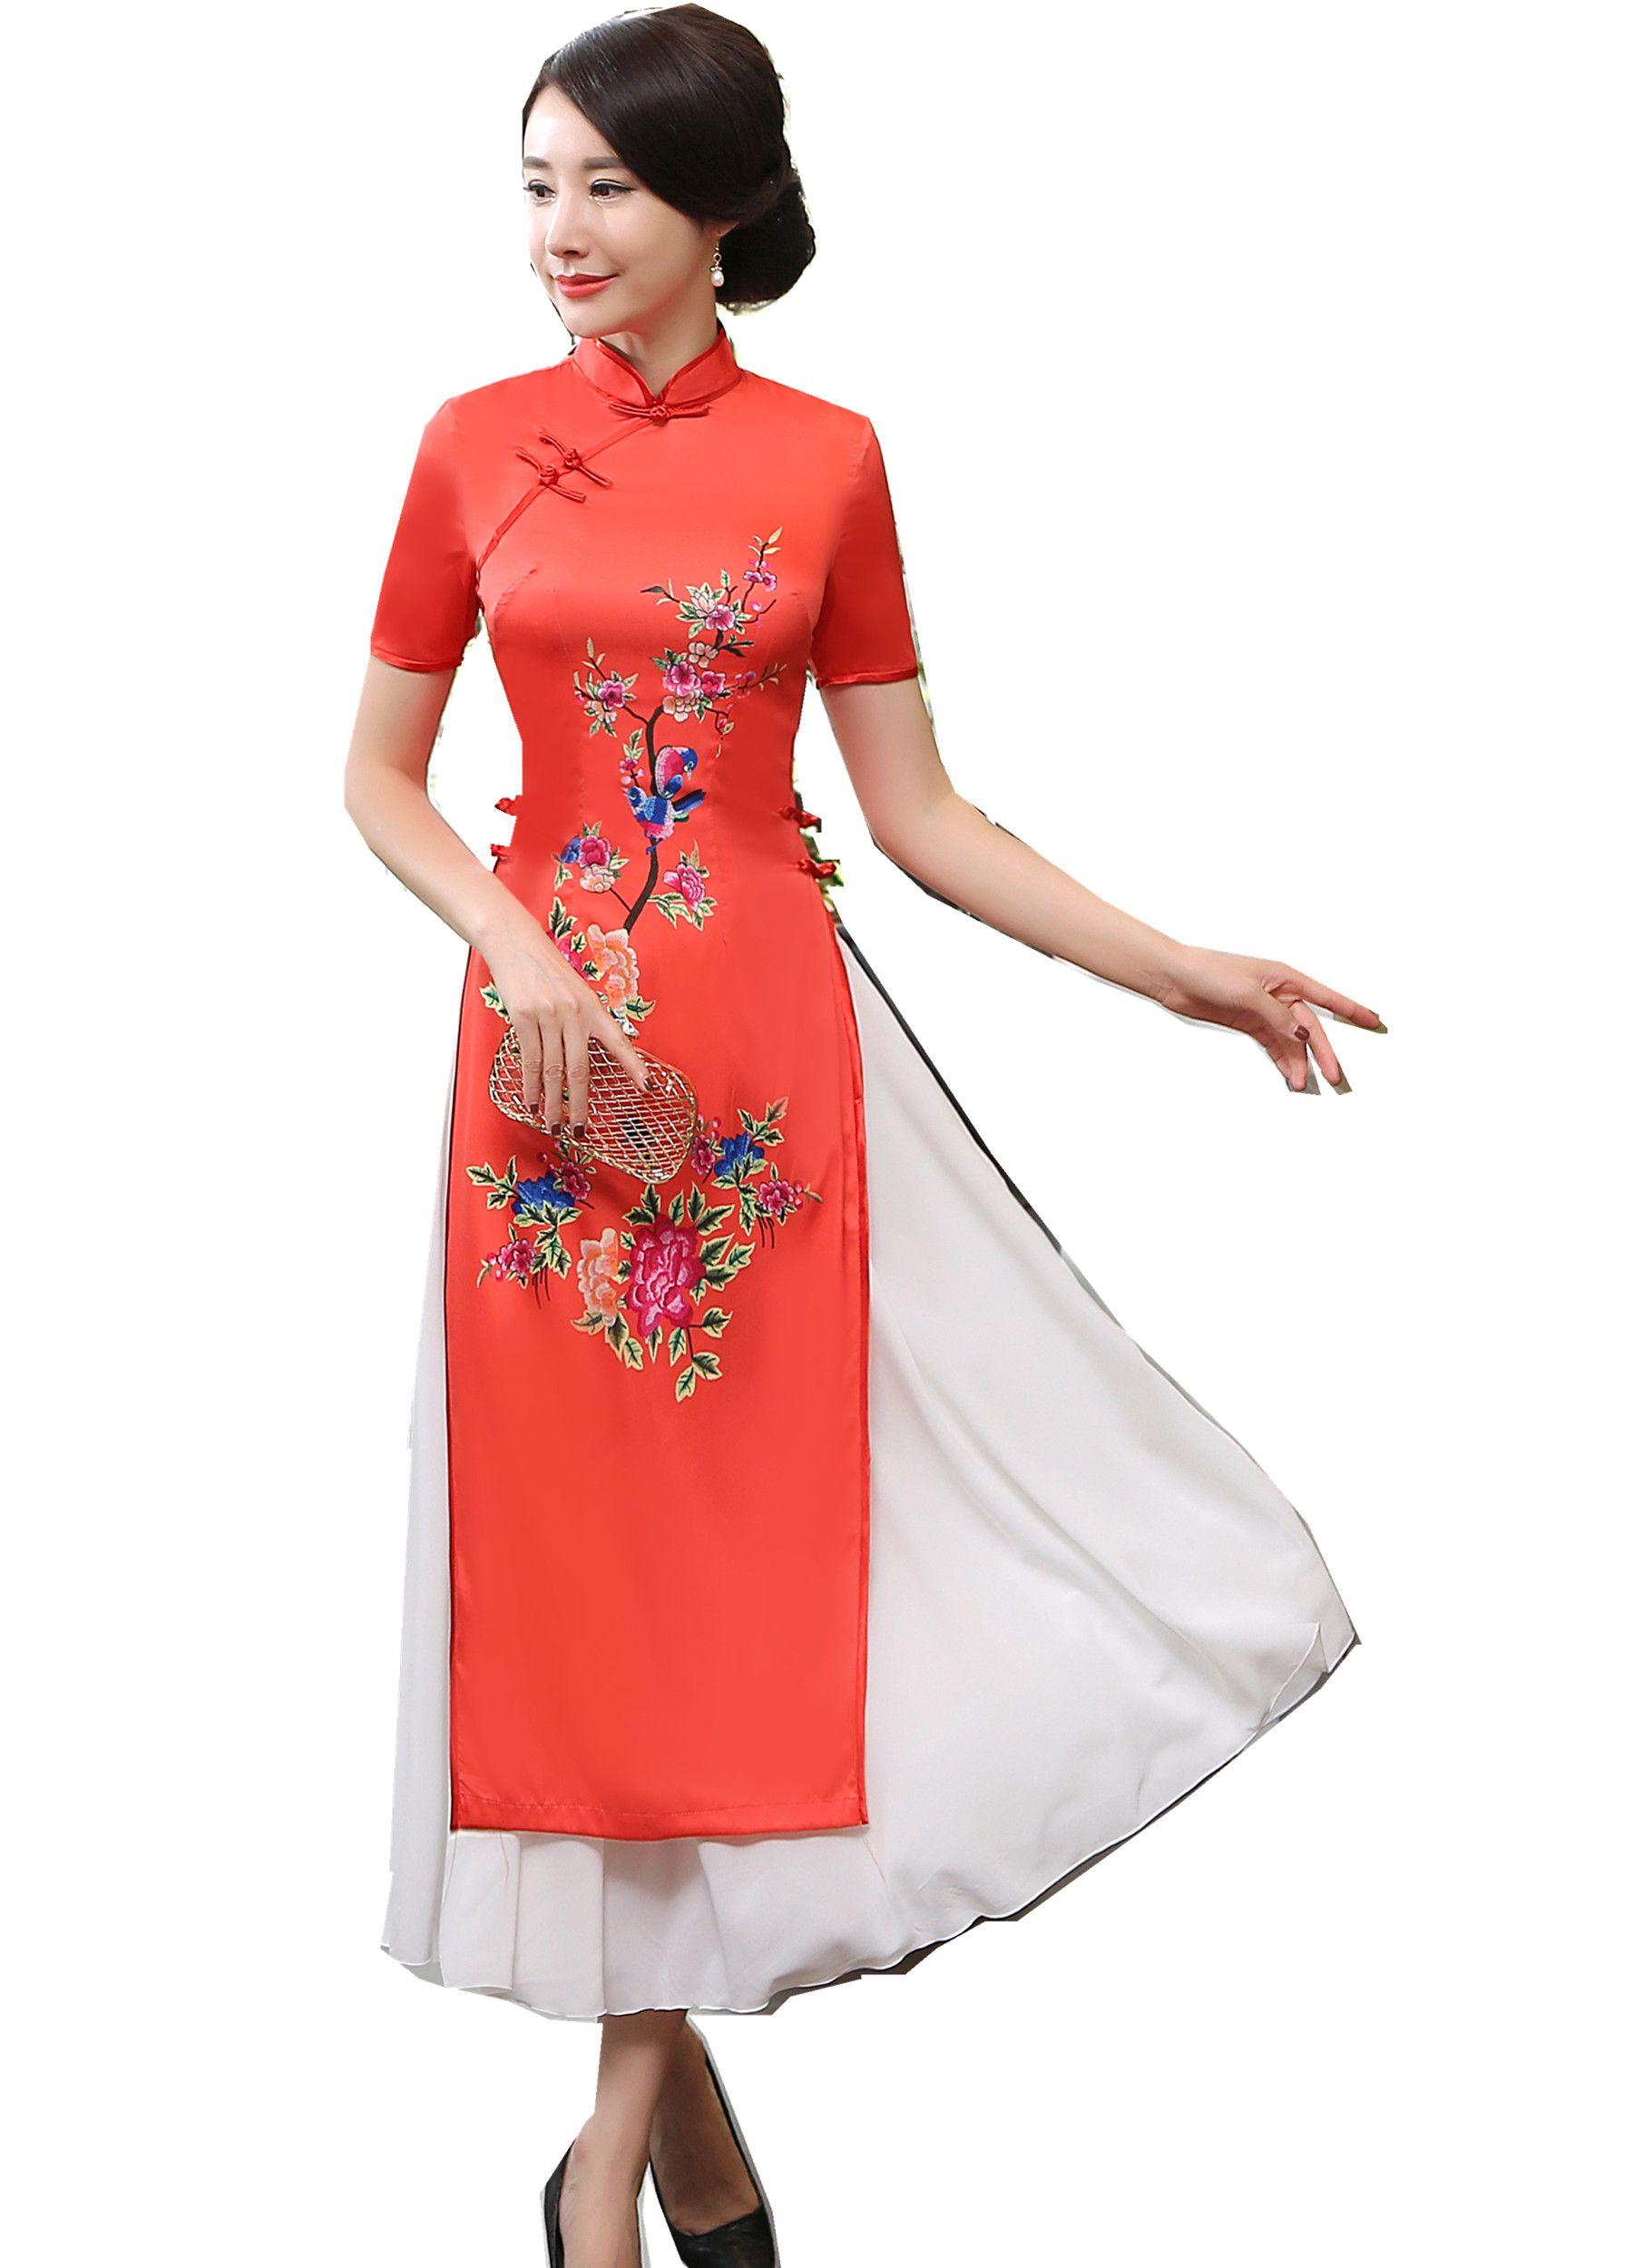 1665bb591 Compre Shanghai Story Vietnam Aodai Ropa Tradicional China Para Mujer  Vestido Largo Chino Oriental Qipao Rojo Cheongsam Ao Dai A  41.92 Del  Glacier315 ...